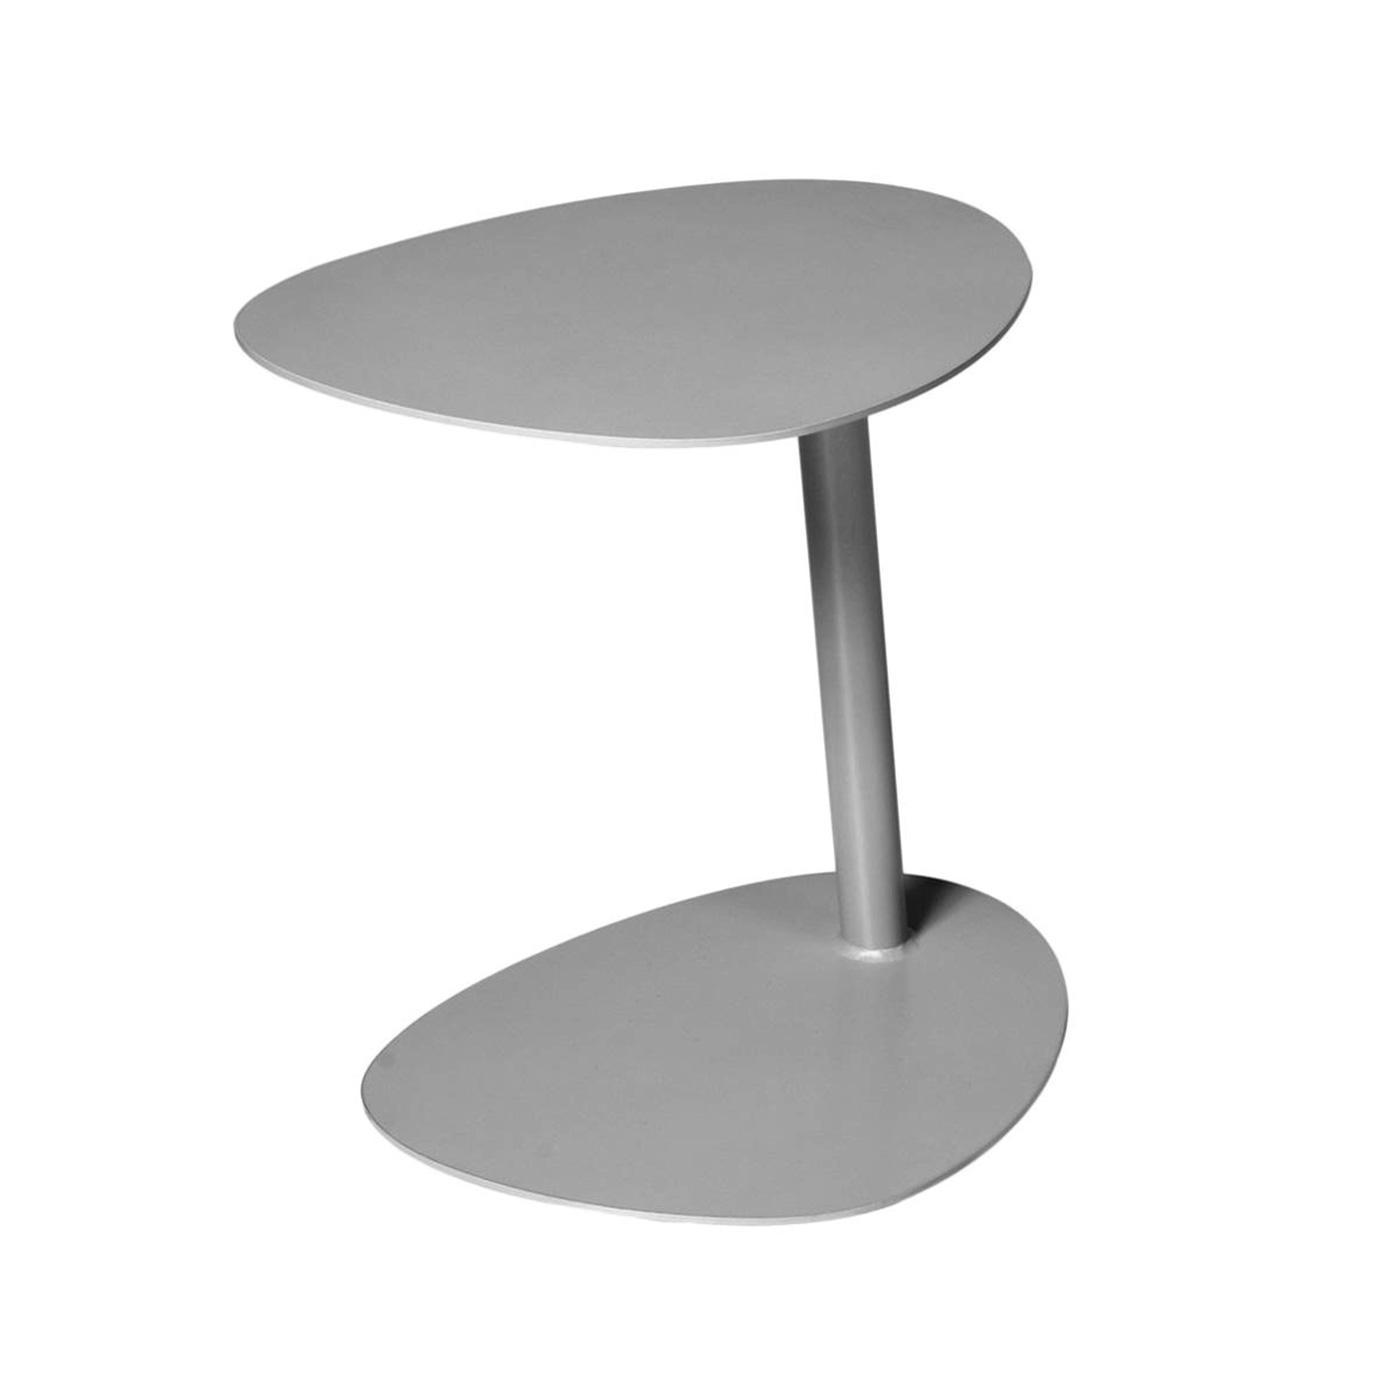 pebble-side-table-grey